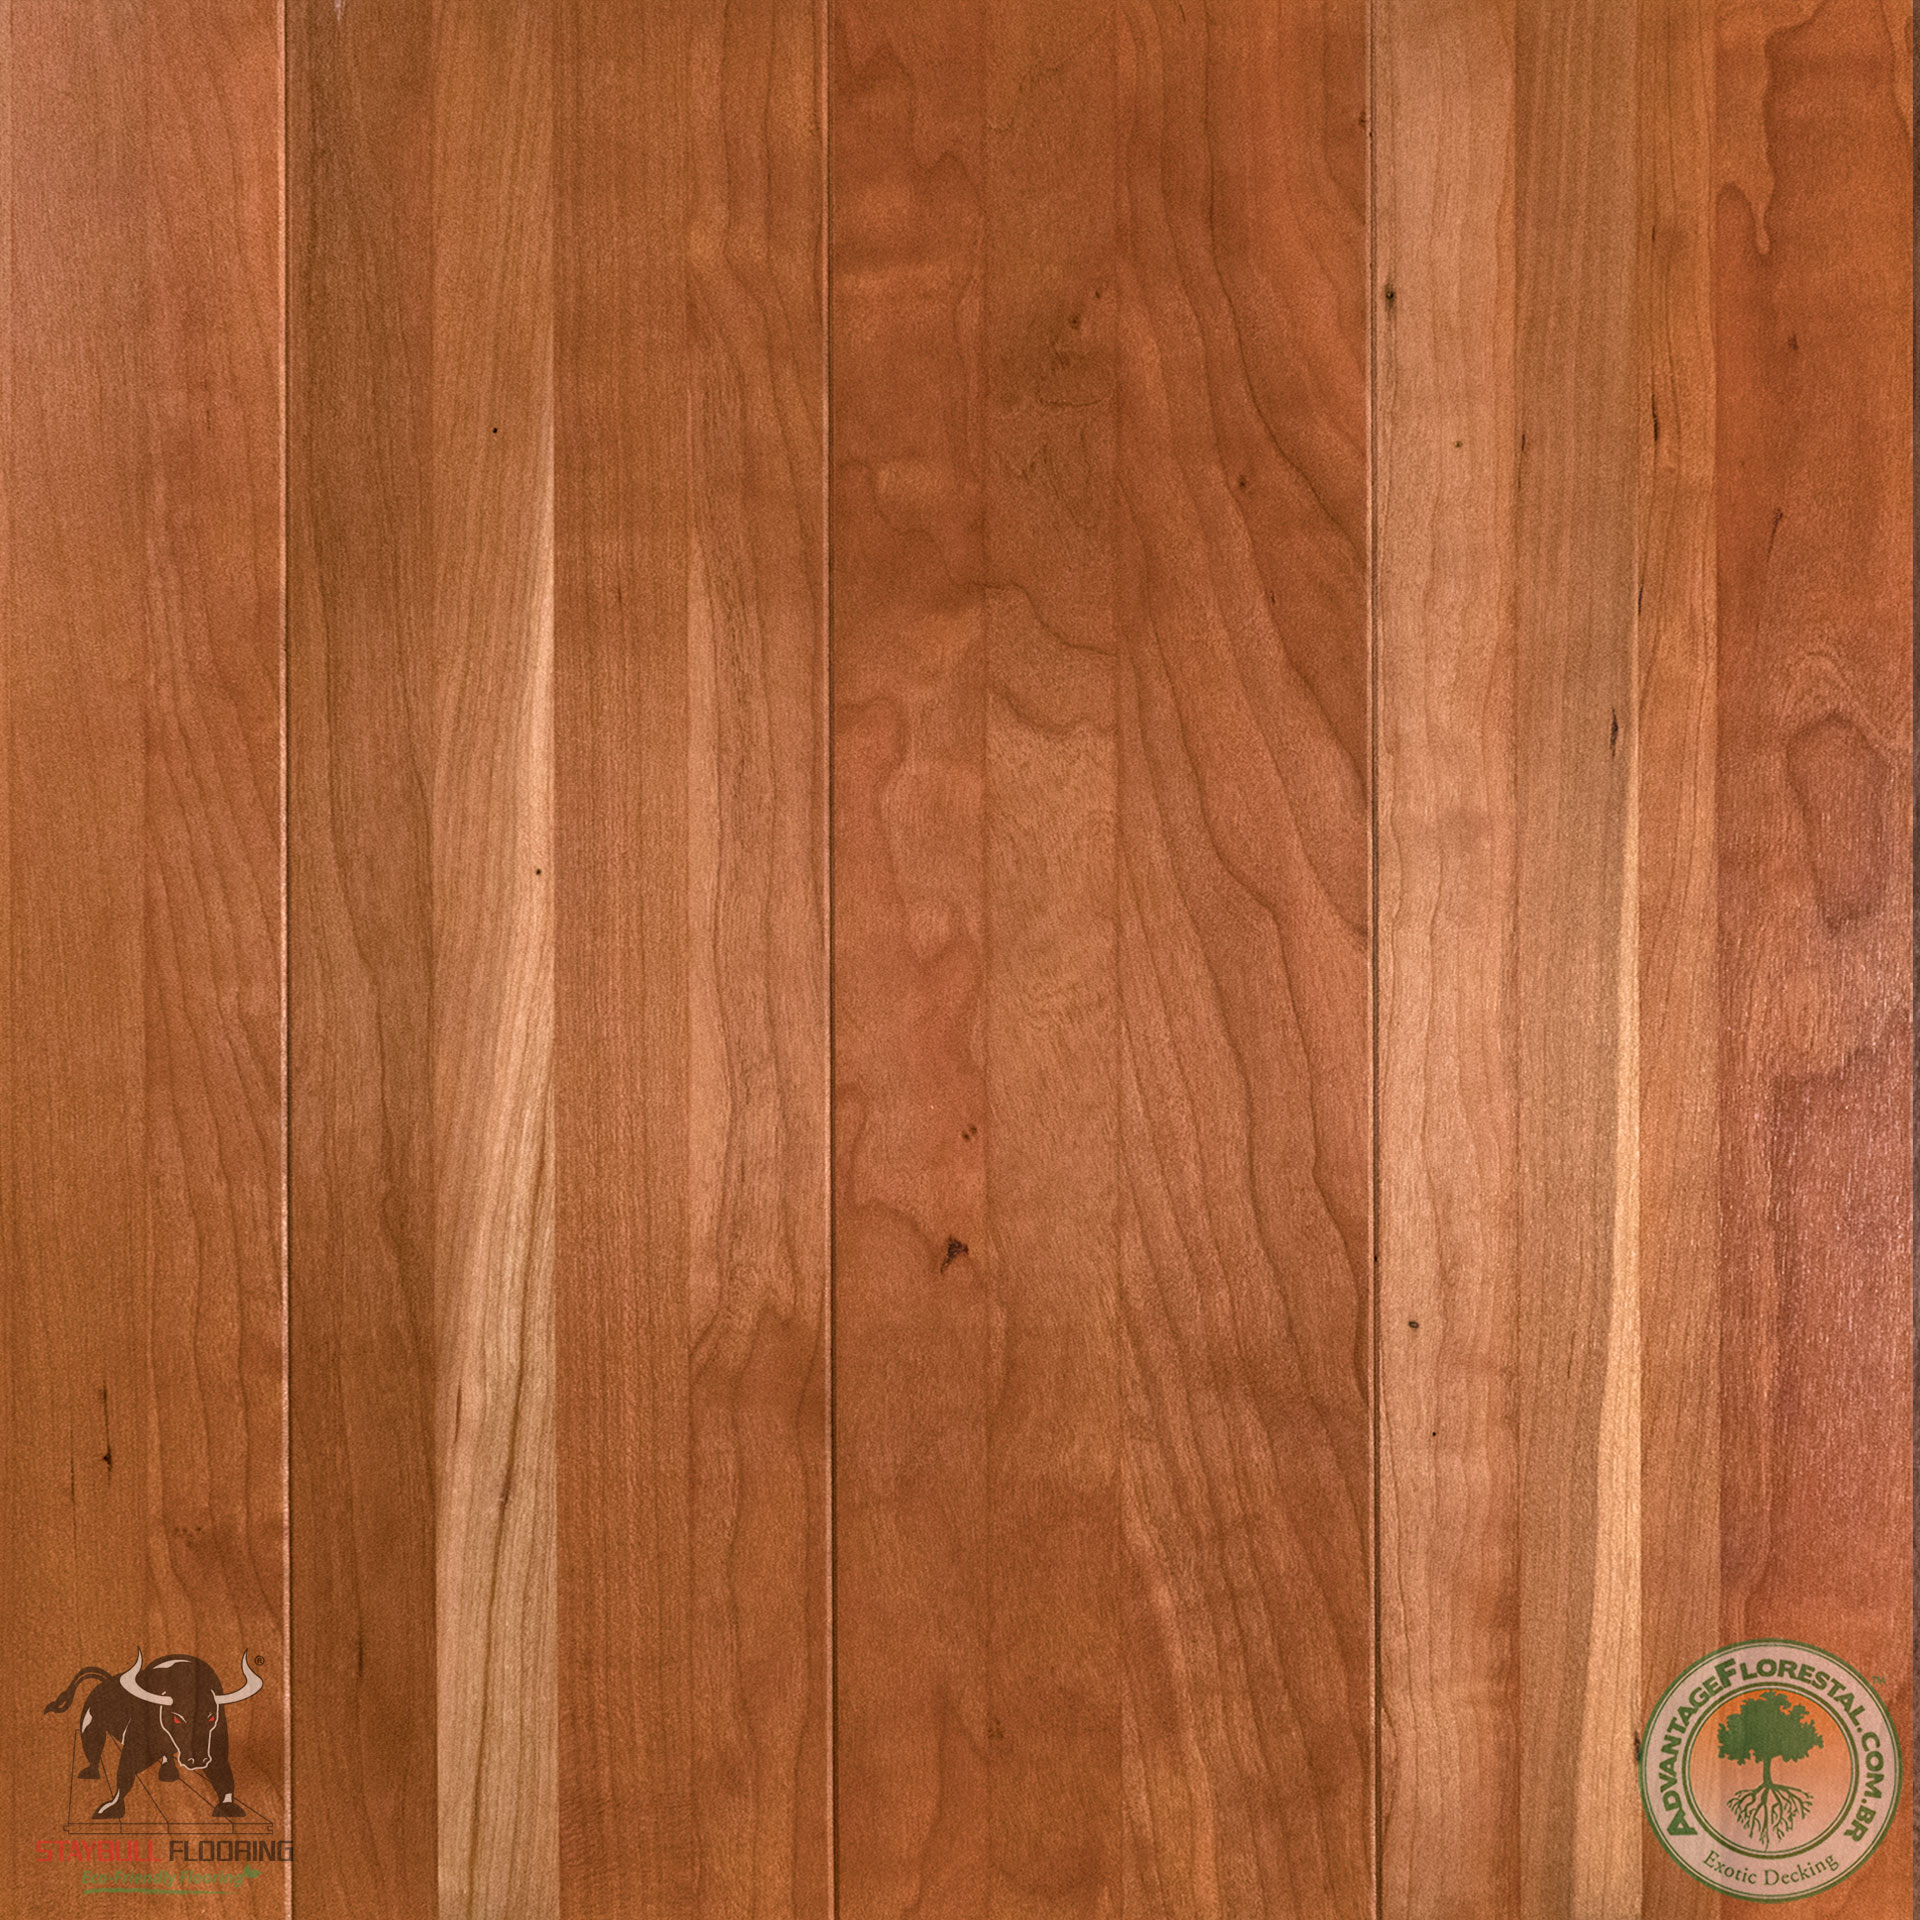 Wholesale StayBull Cherry Hardwood Flooring